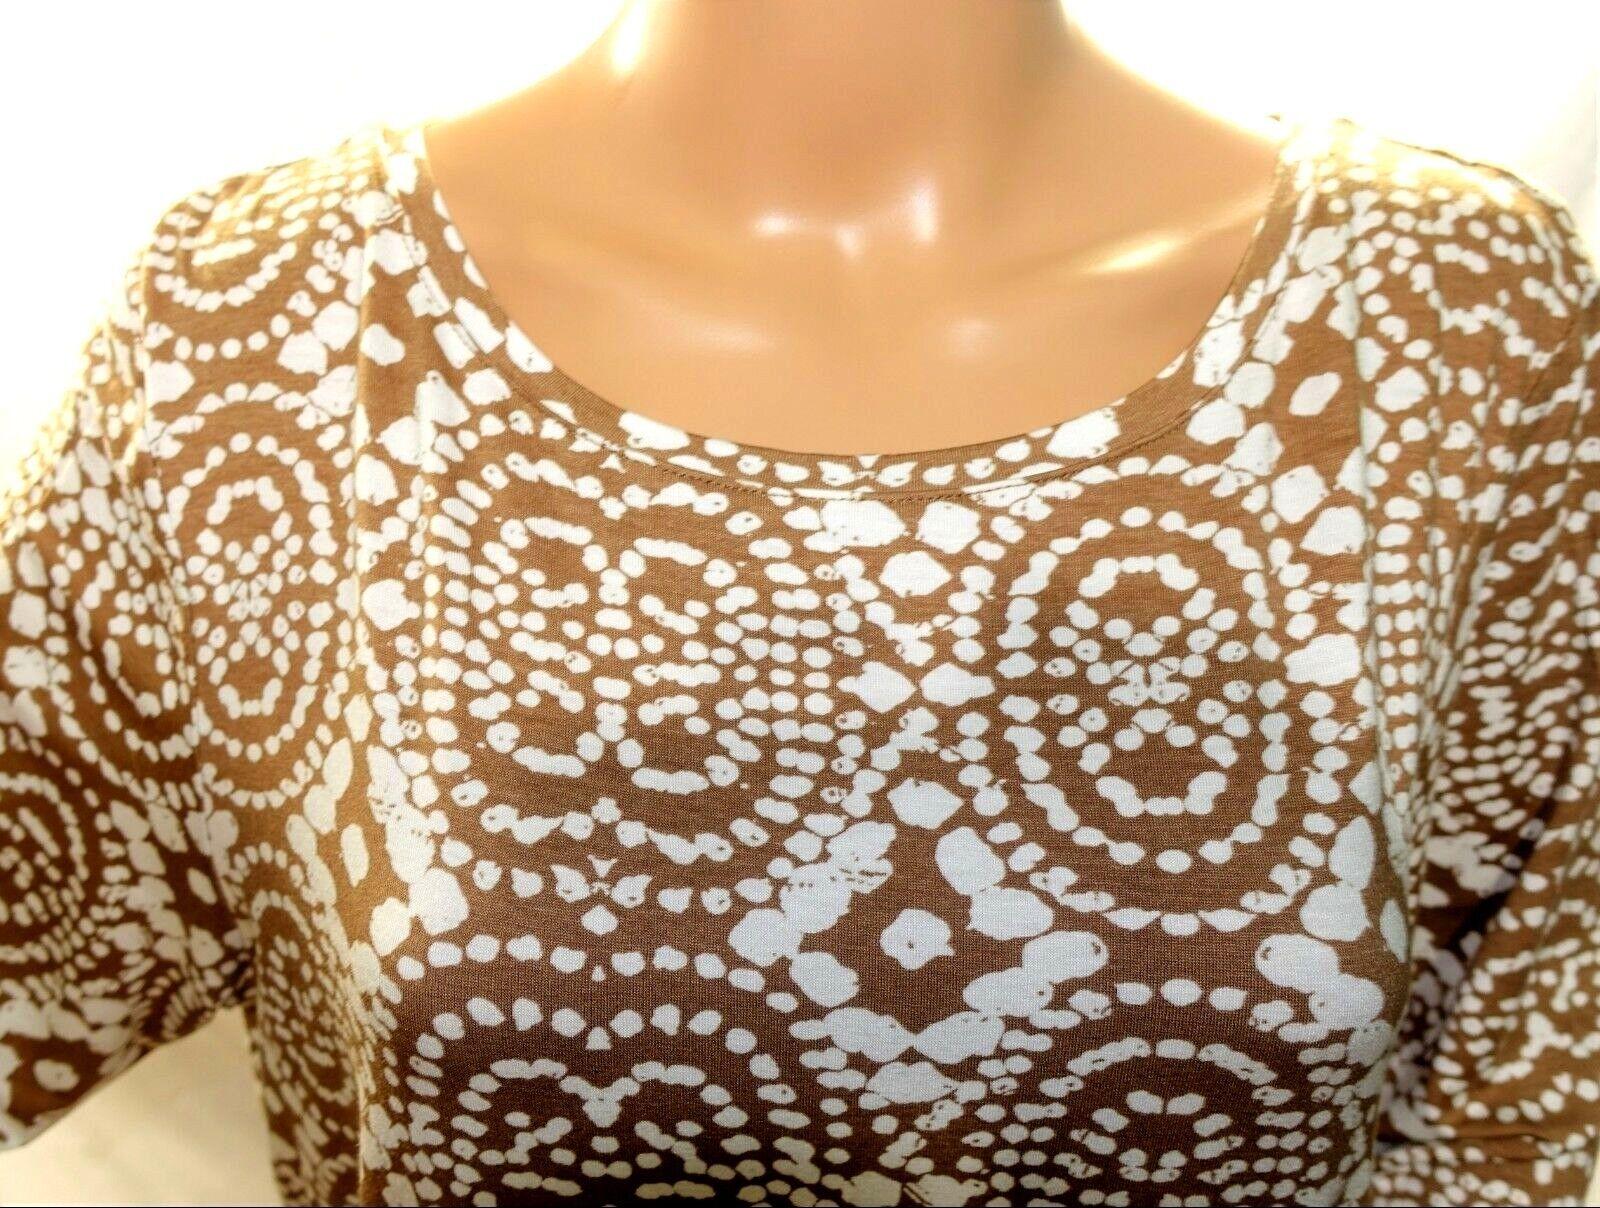 Women Petite Size PXL Tan Ivory Brown Tee T Shirt Top Blouse Shirt Ruby Rd